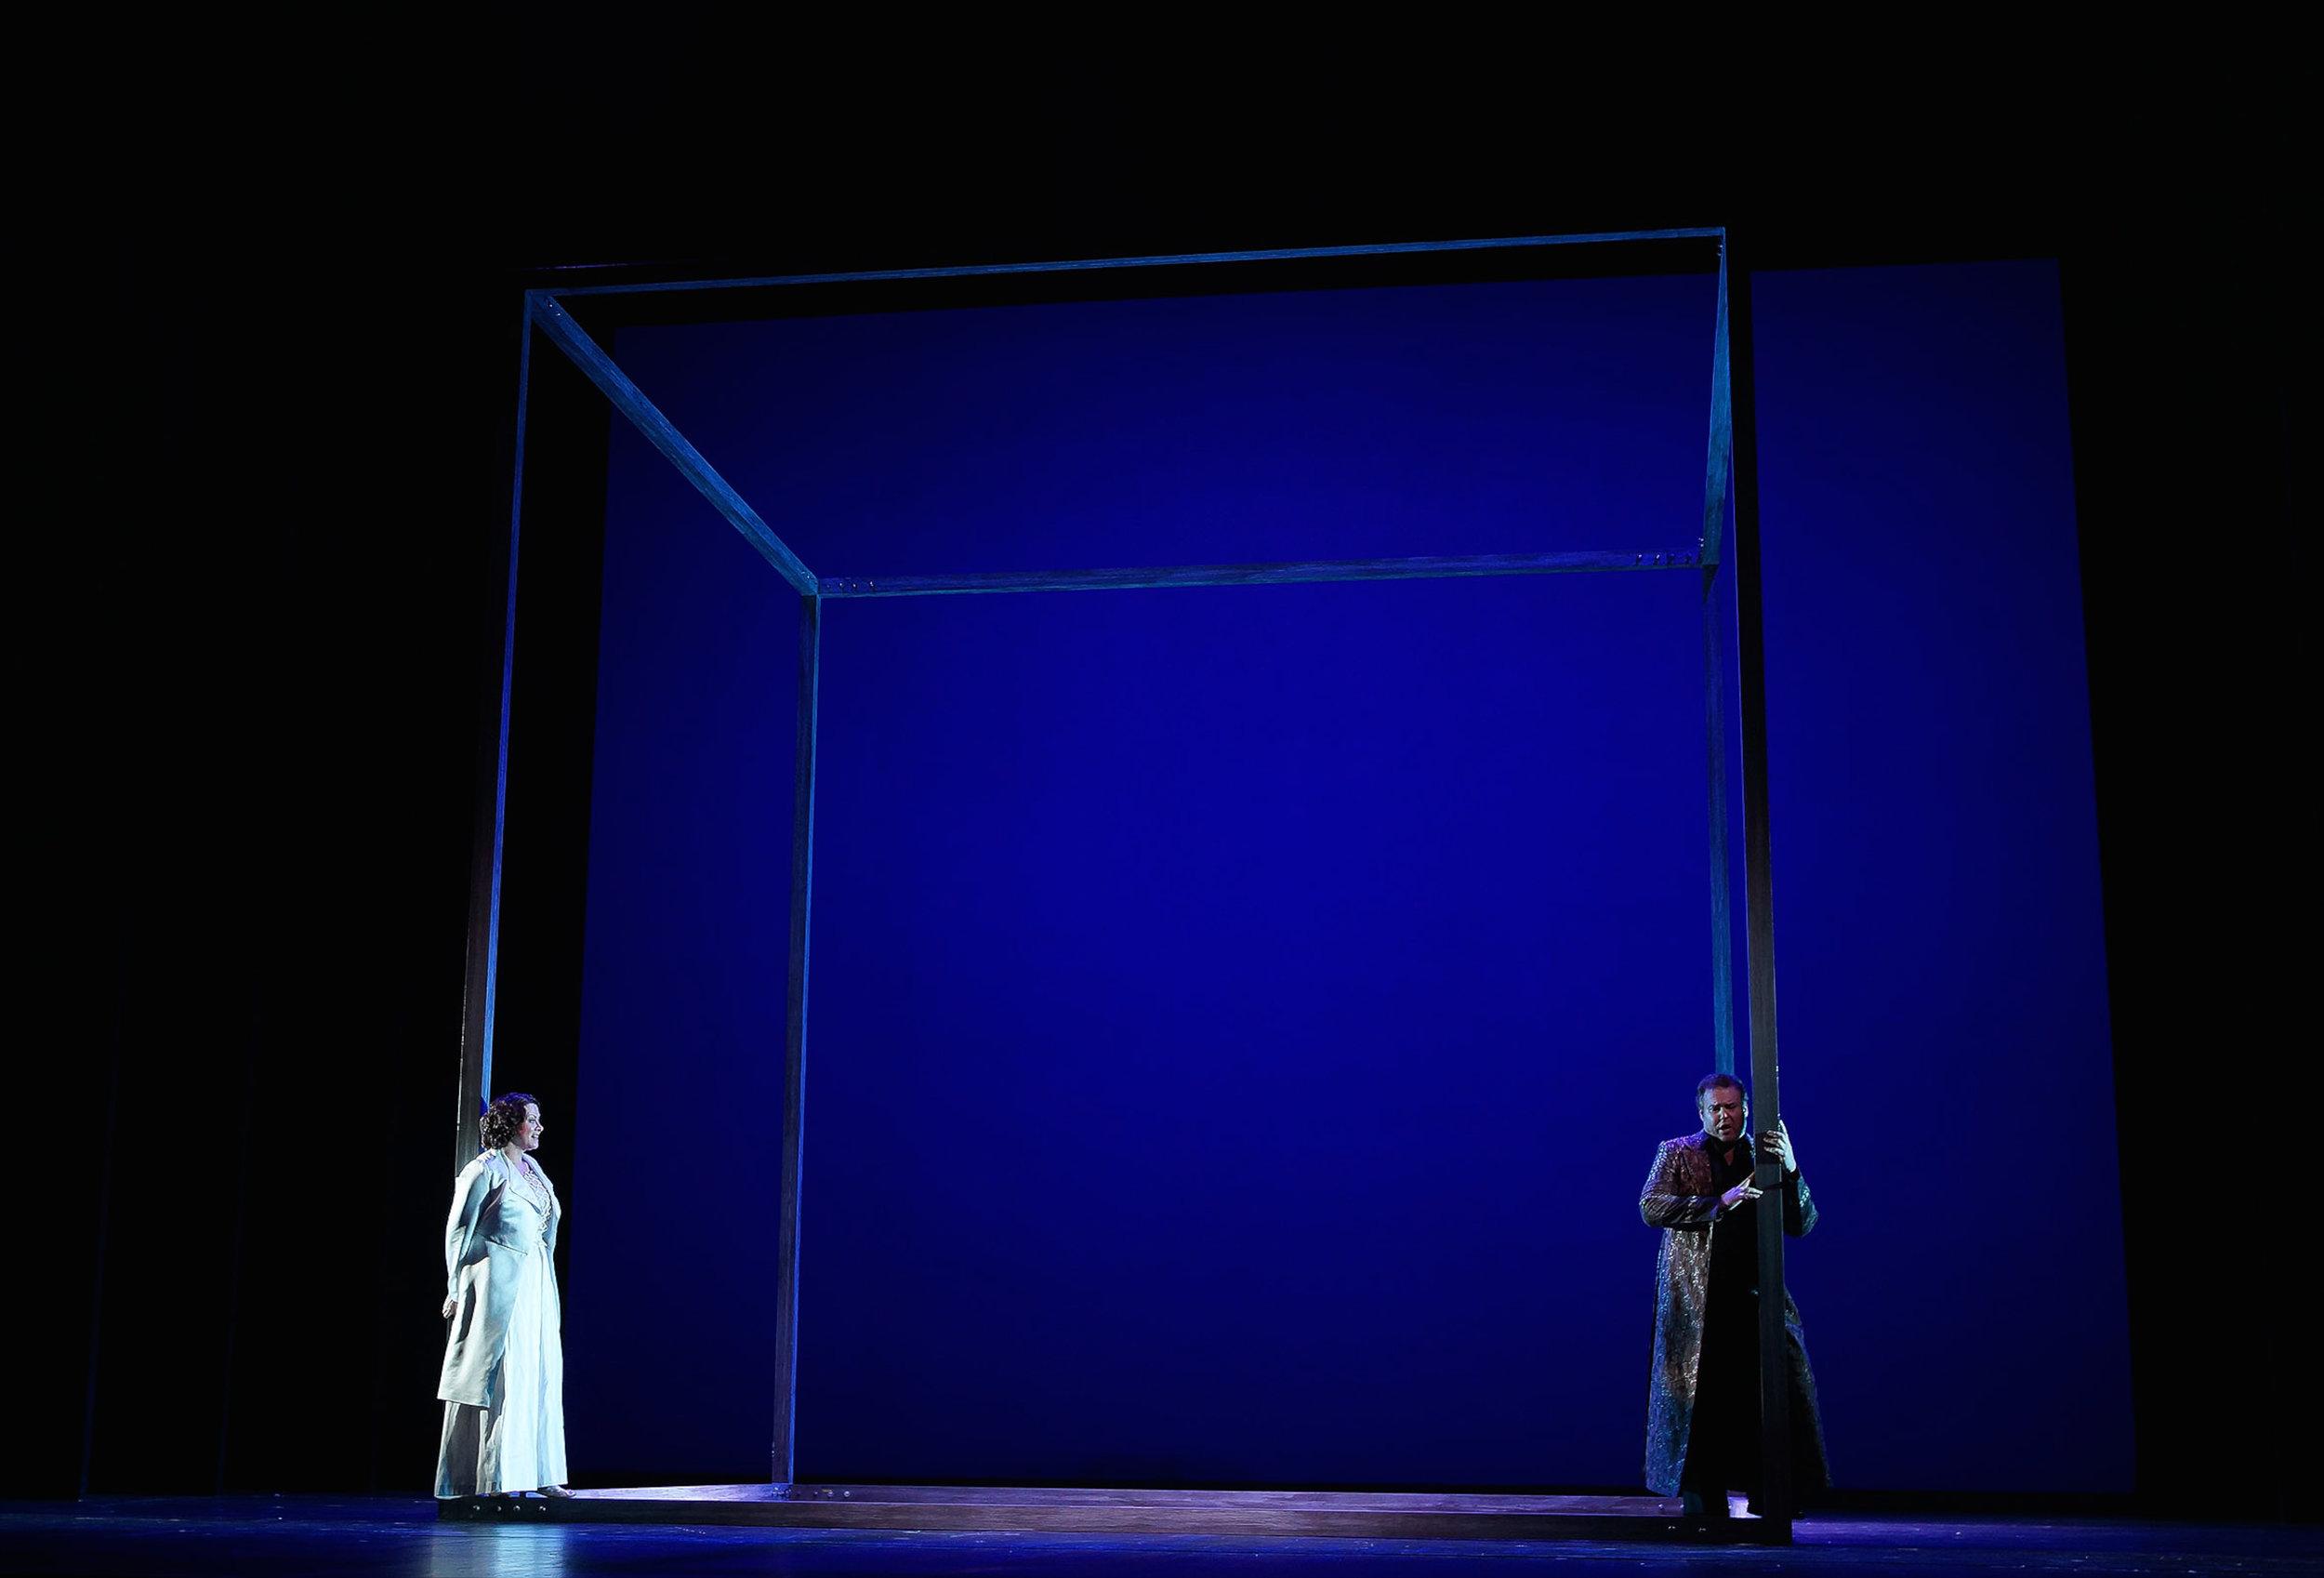 2014_Tristan and Isolde_Oper Kiel_Photo Olaf Struck_08.jpg